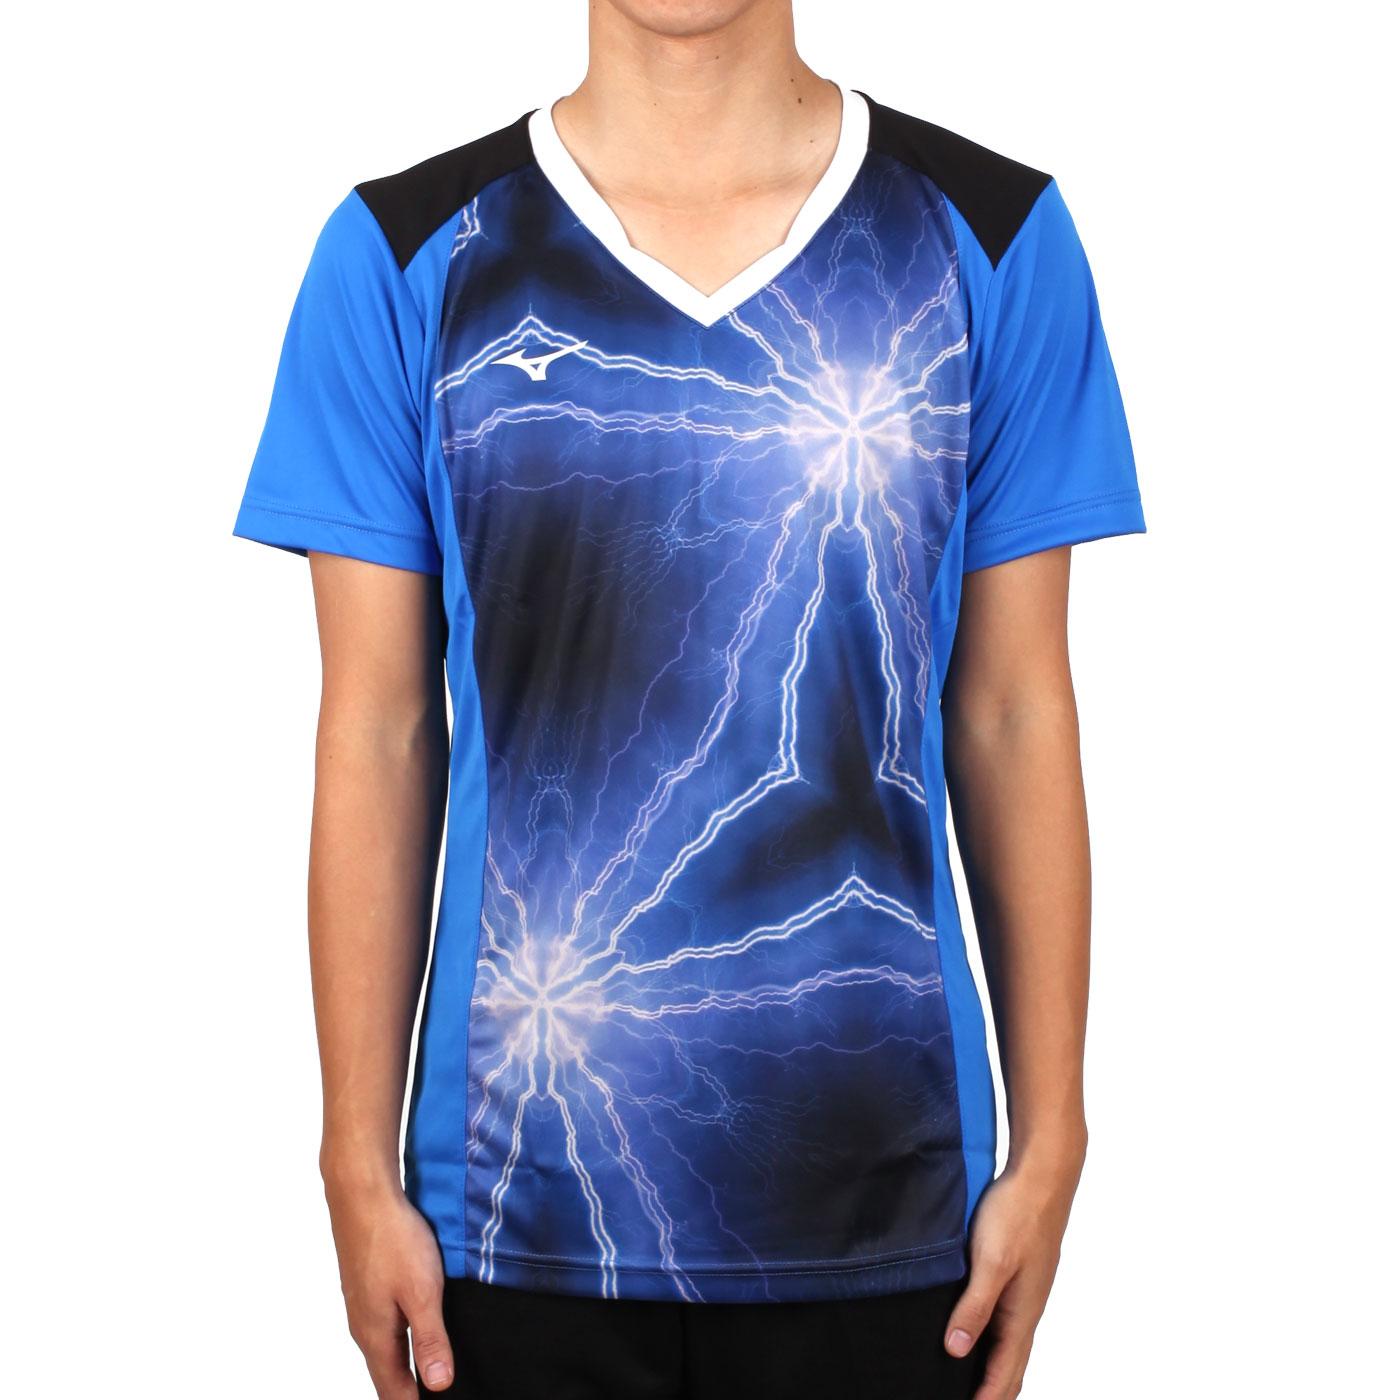 MIZUNO 男排球短袖上衣(2017企業排球聯賽) V2TA7A3081D - 藍黑